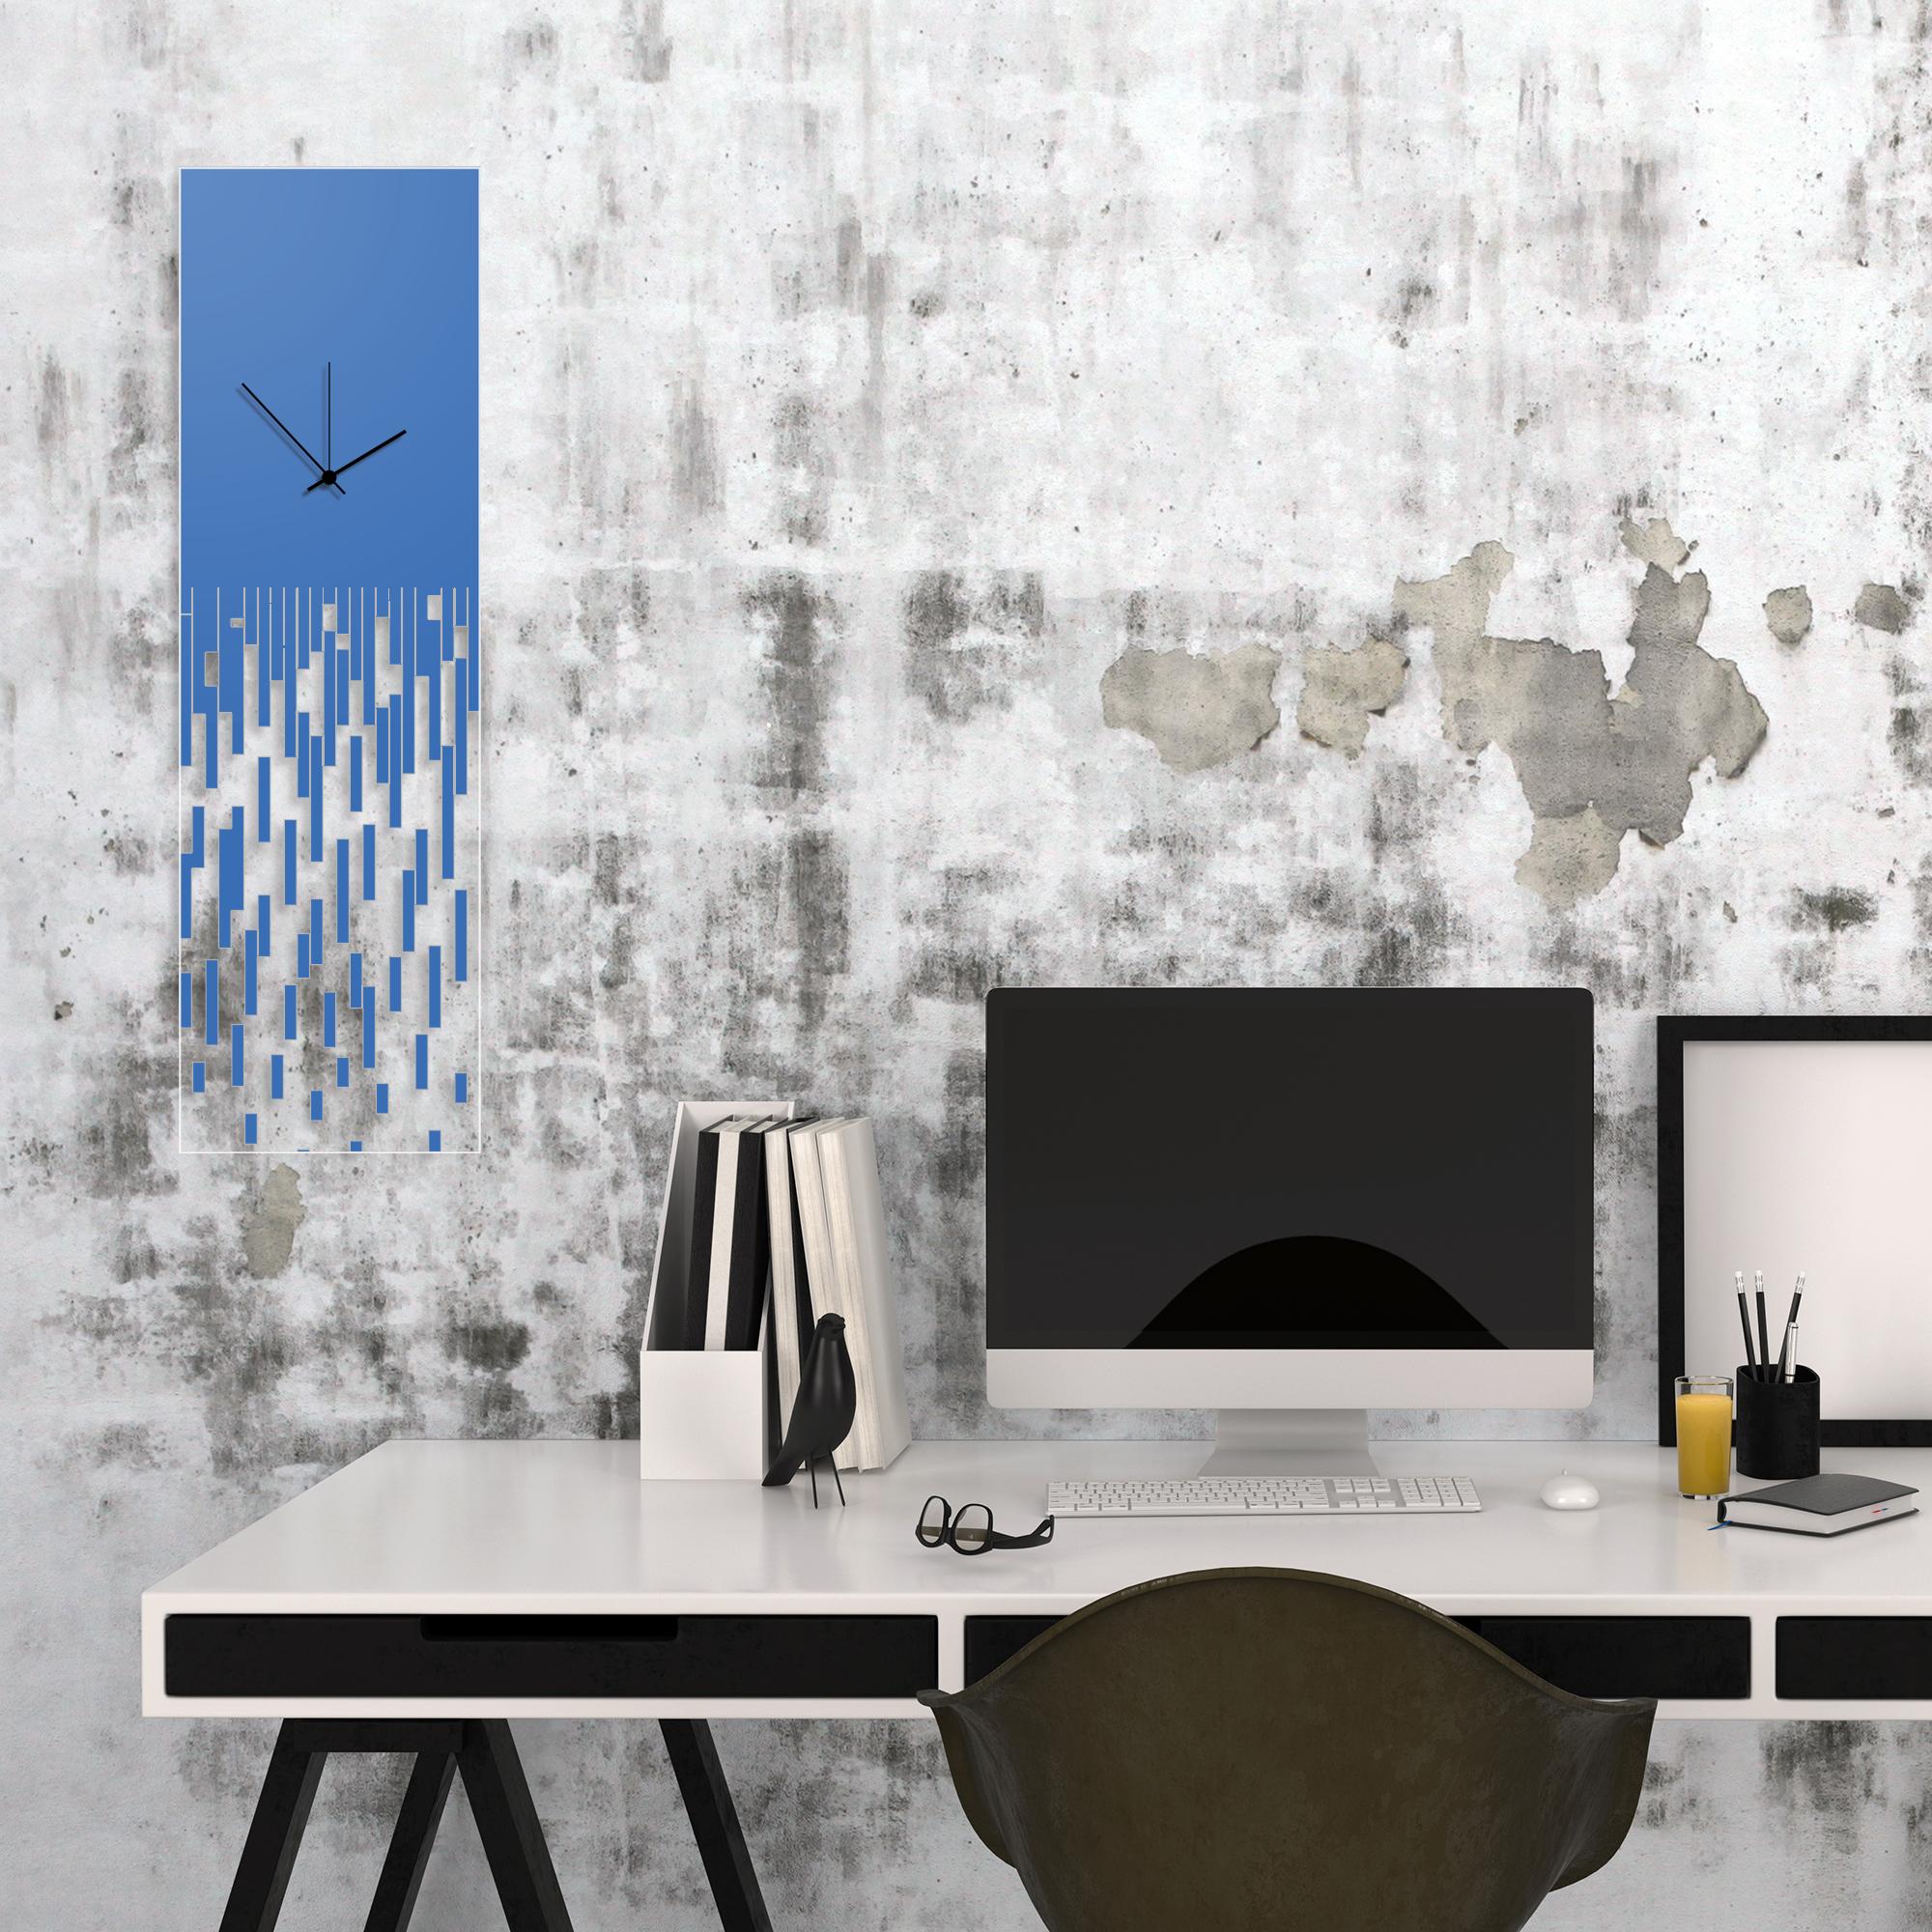 Blue Pixelated Clock by Adam Schwoeppe Surreal Wall Clock on Acrylic - Alternate View 1